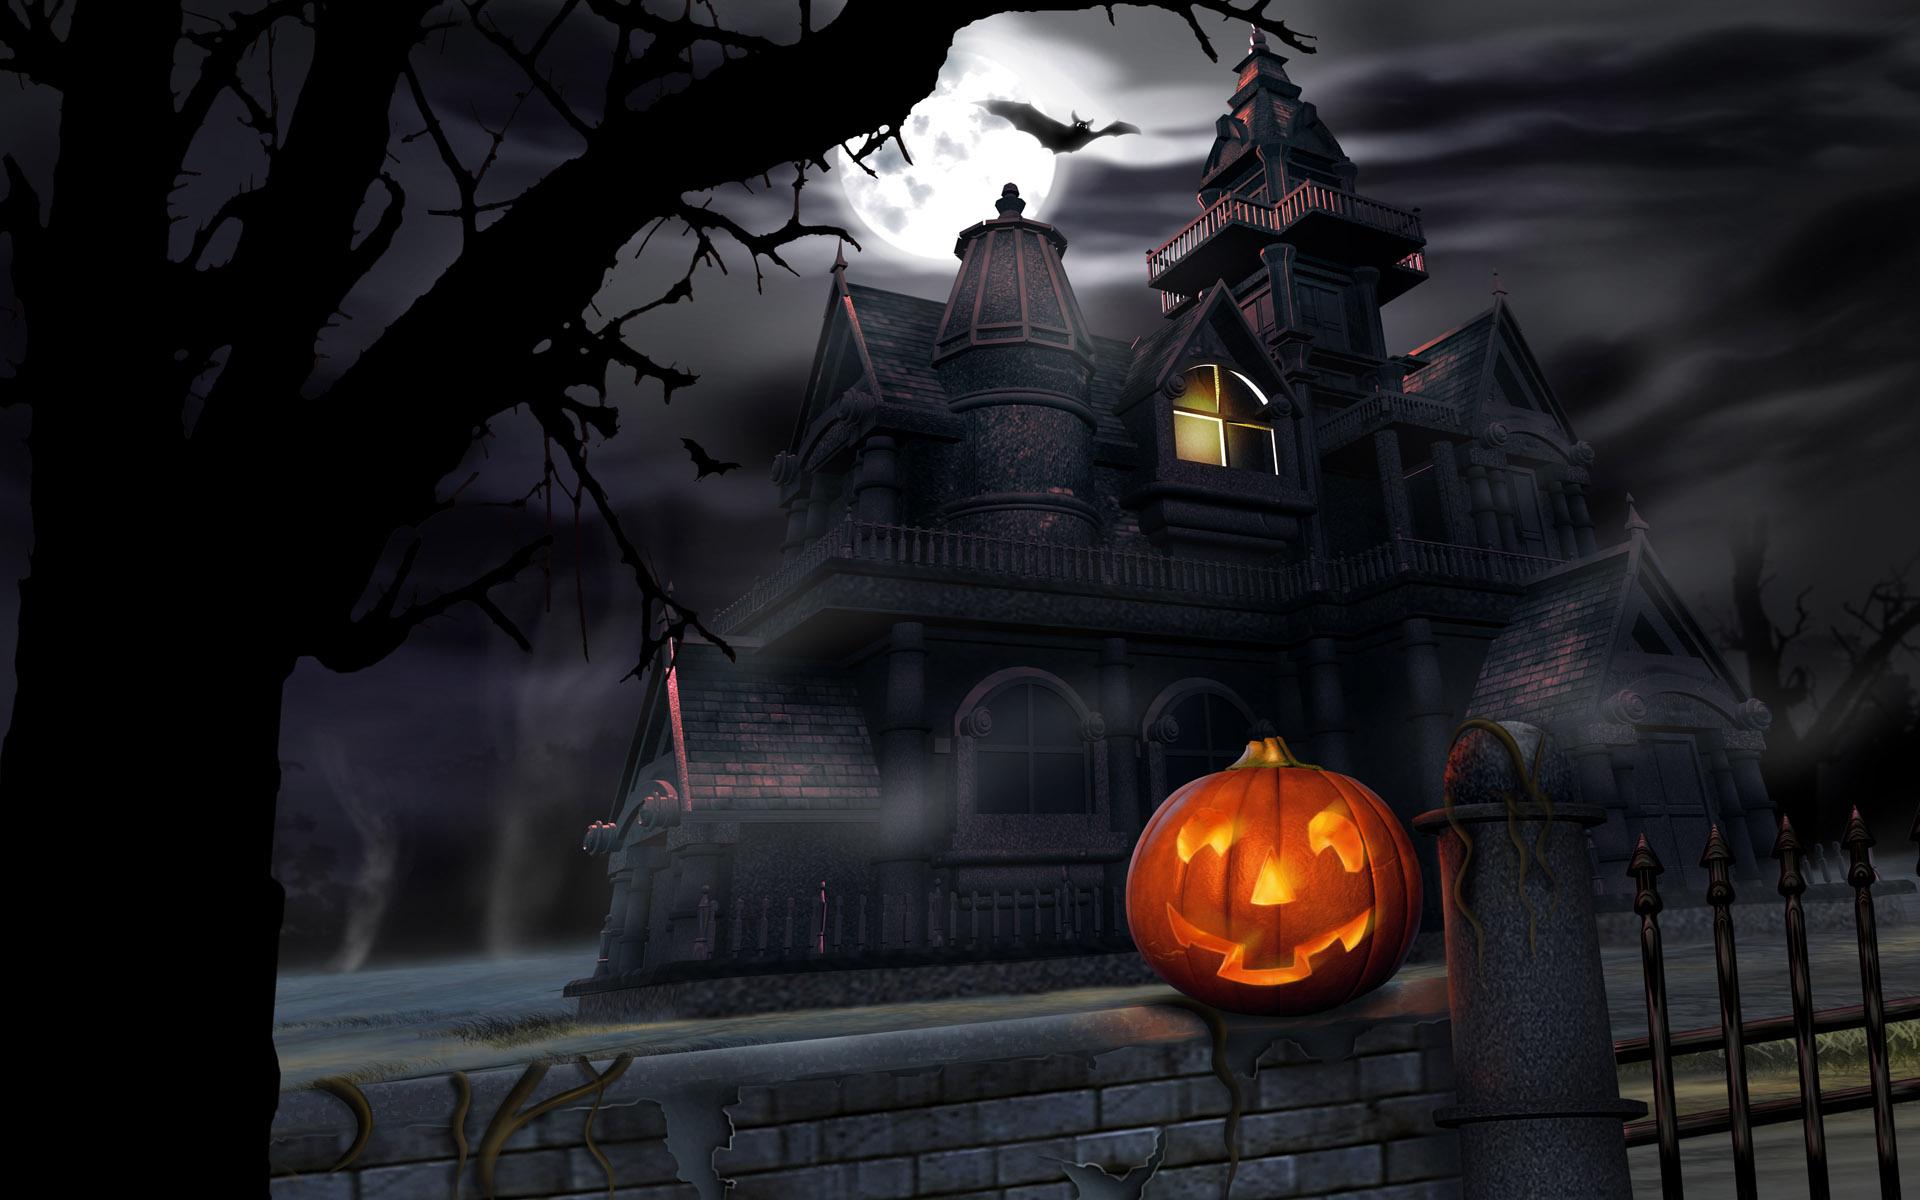 horror haunted HalloweenFantasy Gothic Dark Horror Wallpapers 1920x1200